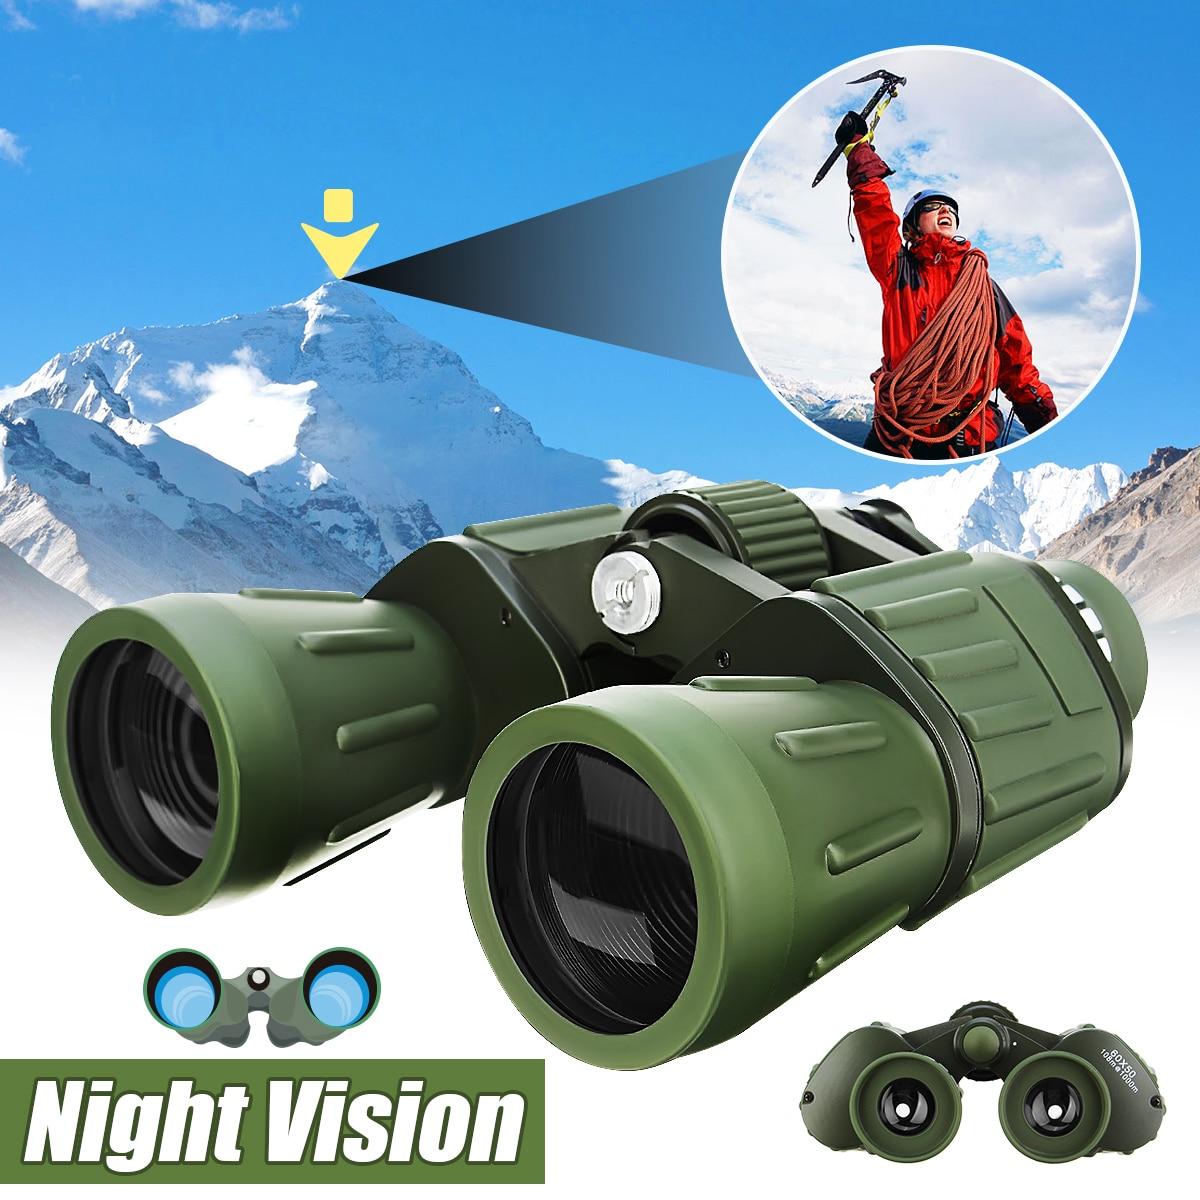 все цены на Night Vision 60x50 HD Binoculars Military Zoom Powerful Hunting Optics Astronomical Telescope Objective + Eyepiece Adjustment онлайн